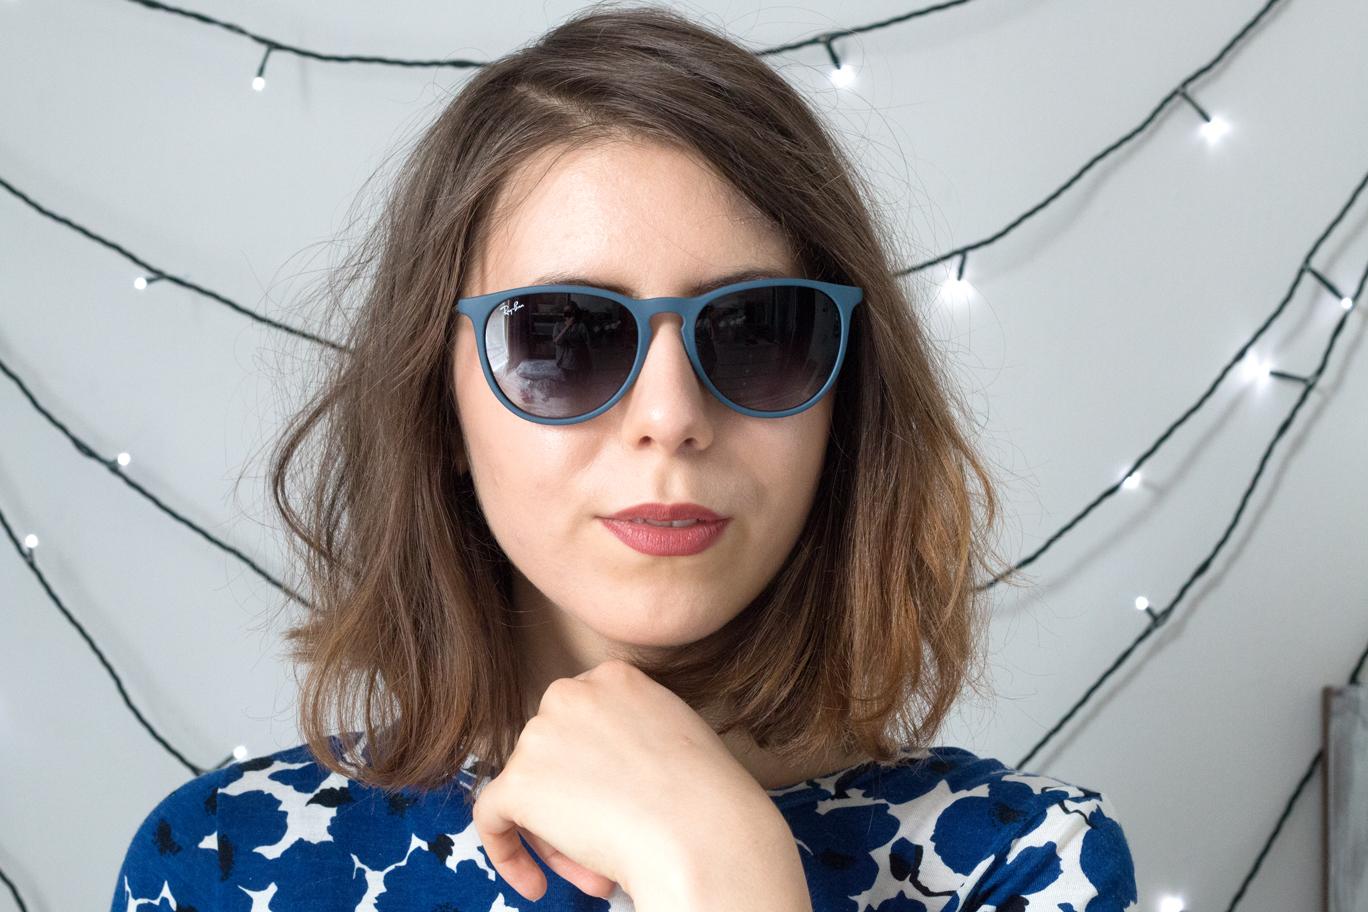 discount ray ban eyeglasses dswq  buy ray ban glasses uk